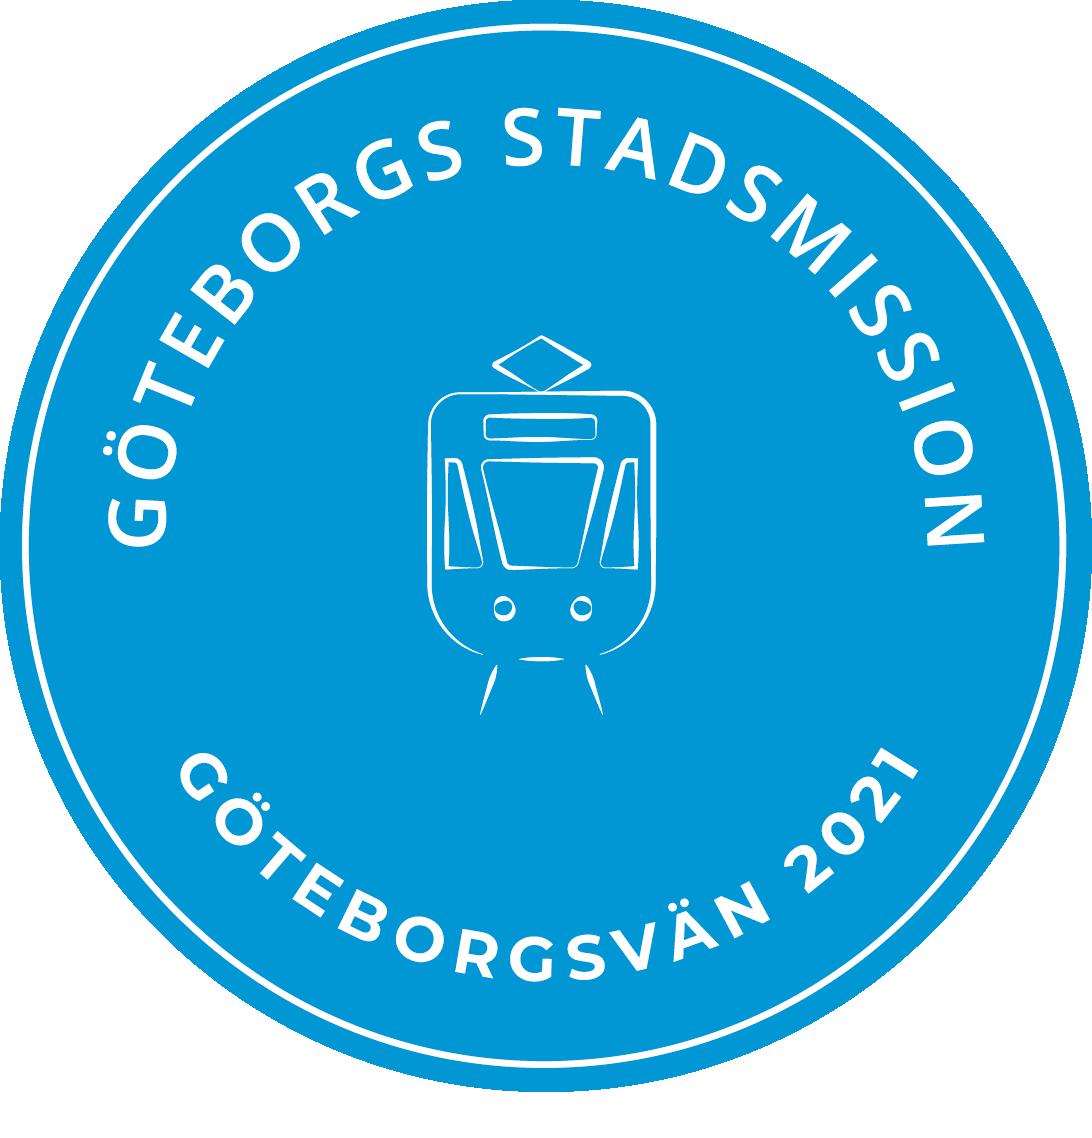 Goteborgsvan_Liten_2021_CMYK